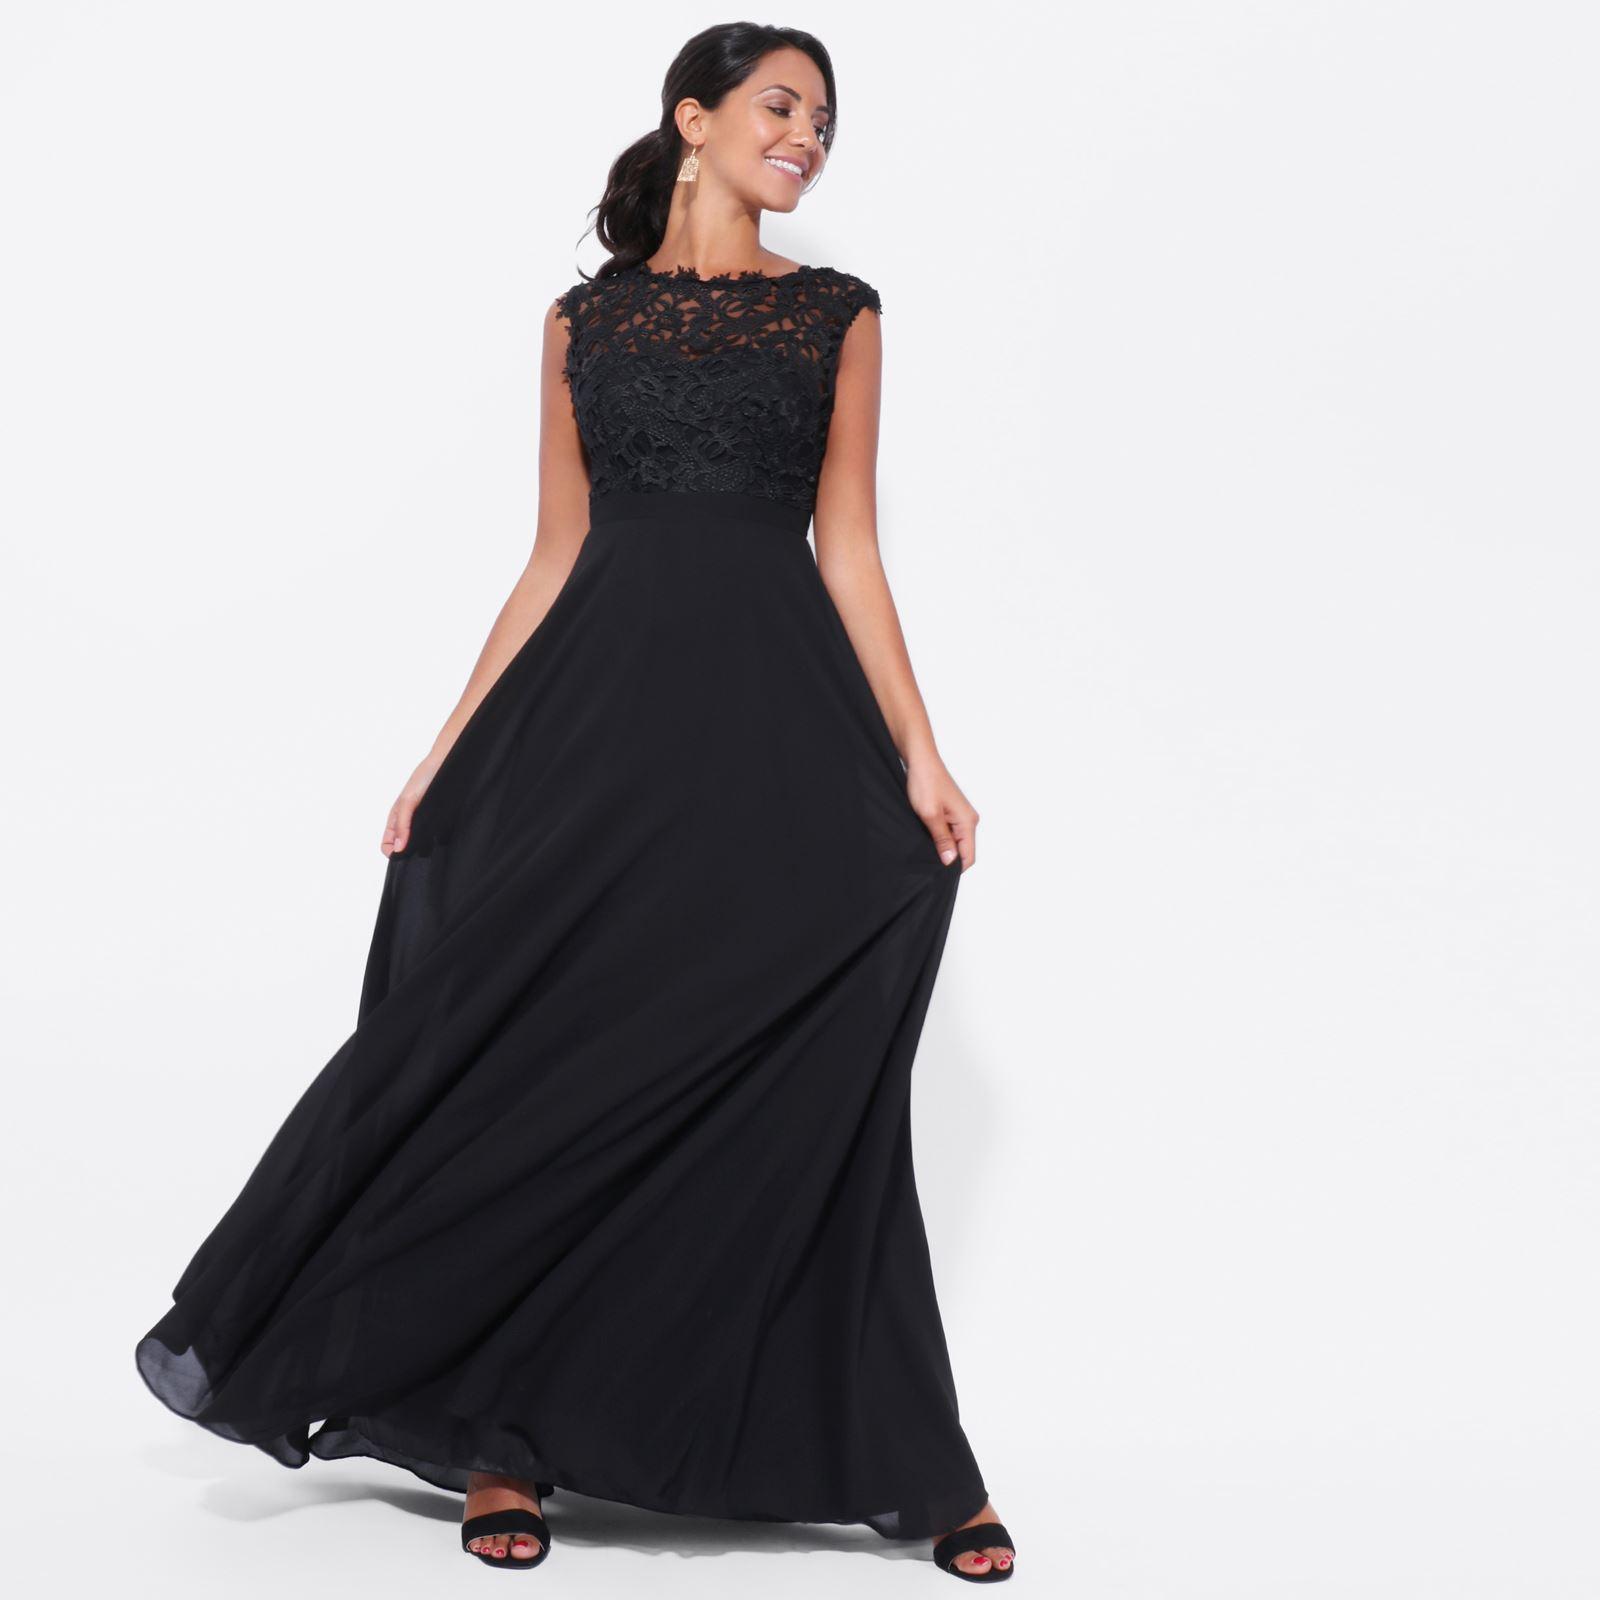 Ebay Ladies Maxi Dresses Size 20